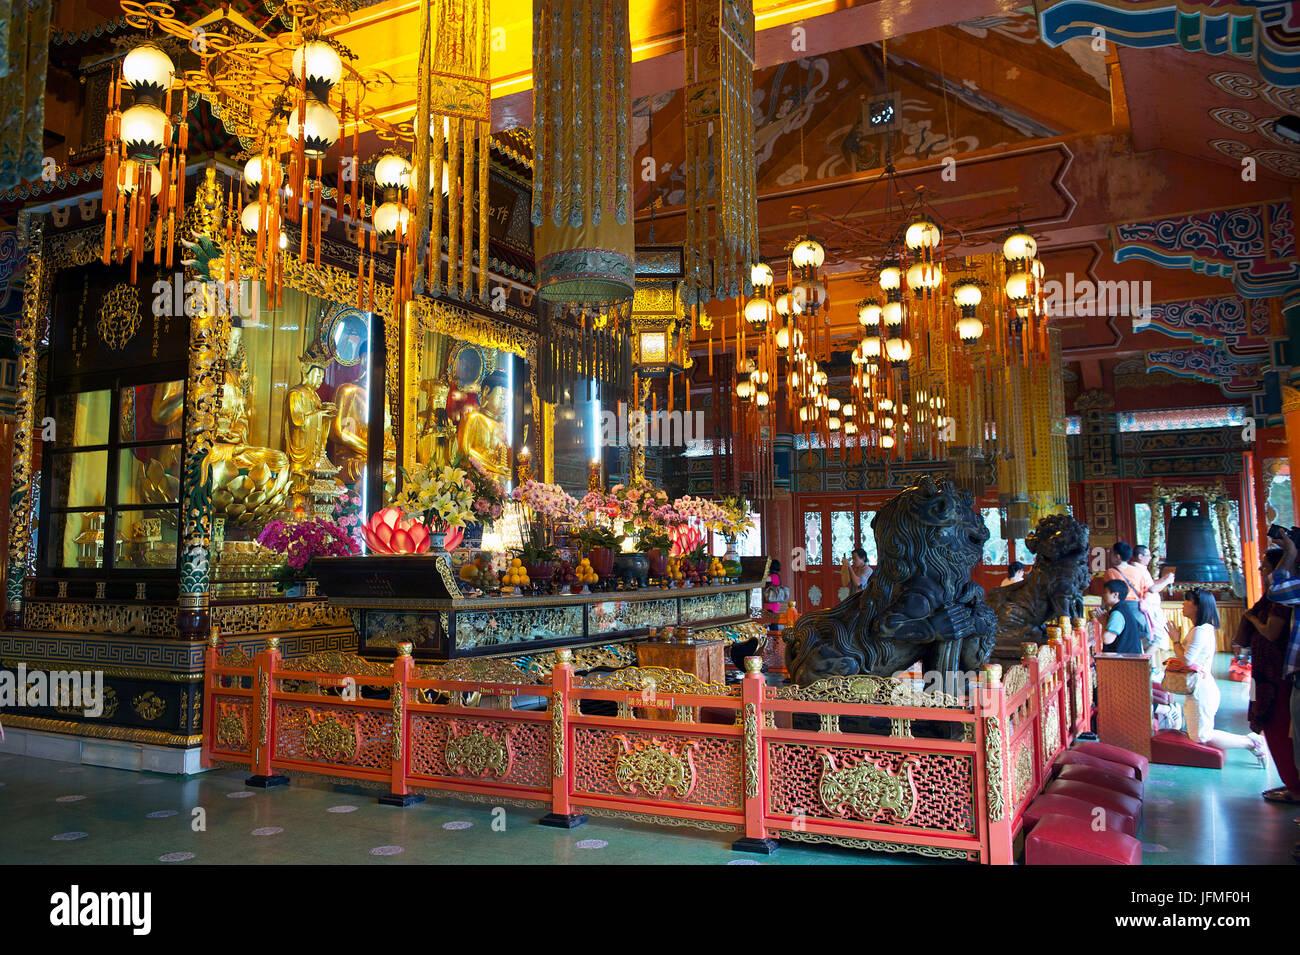 China, Hong Kong, Lantau Island, Po Lin Monastery, Welto Buddhist Temple Stock Photo